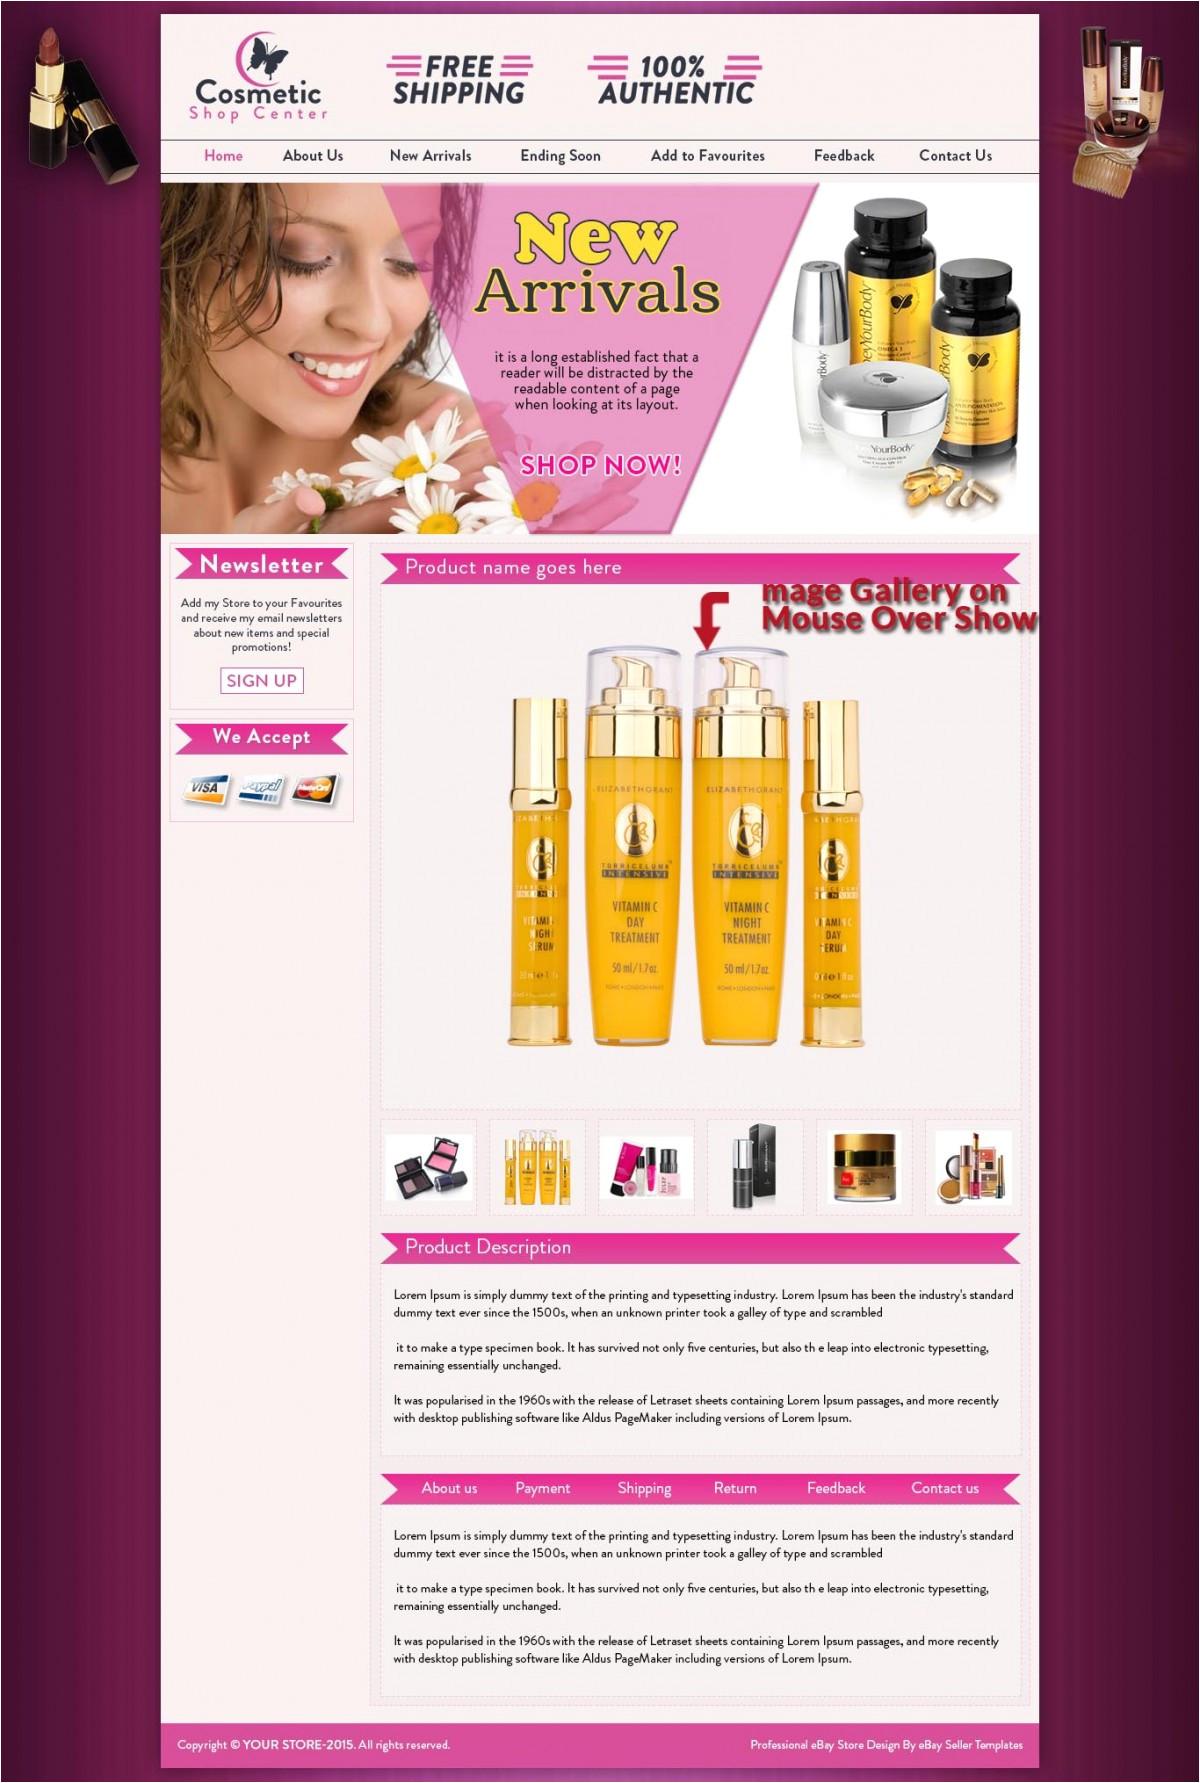 Ebay Product Description Template Pink Body Spa Ebay Store Design Template for 29 99 Ebay